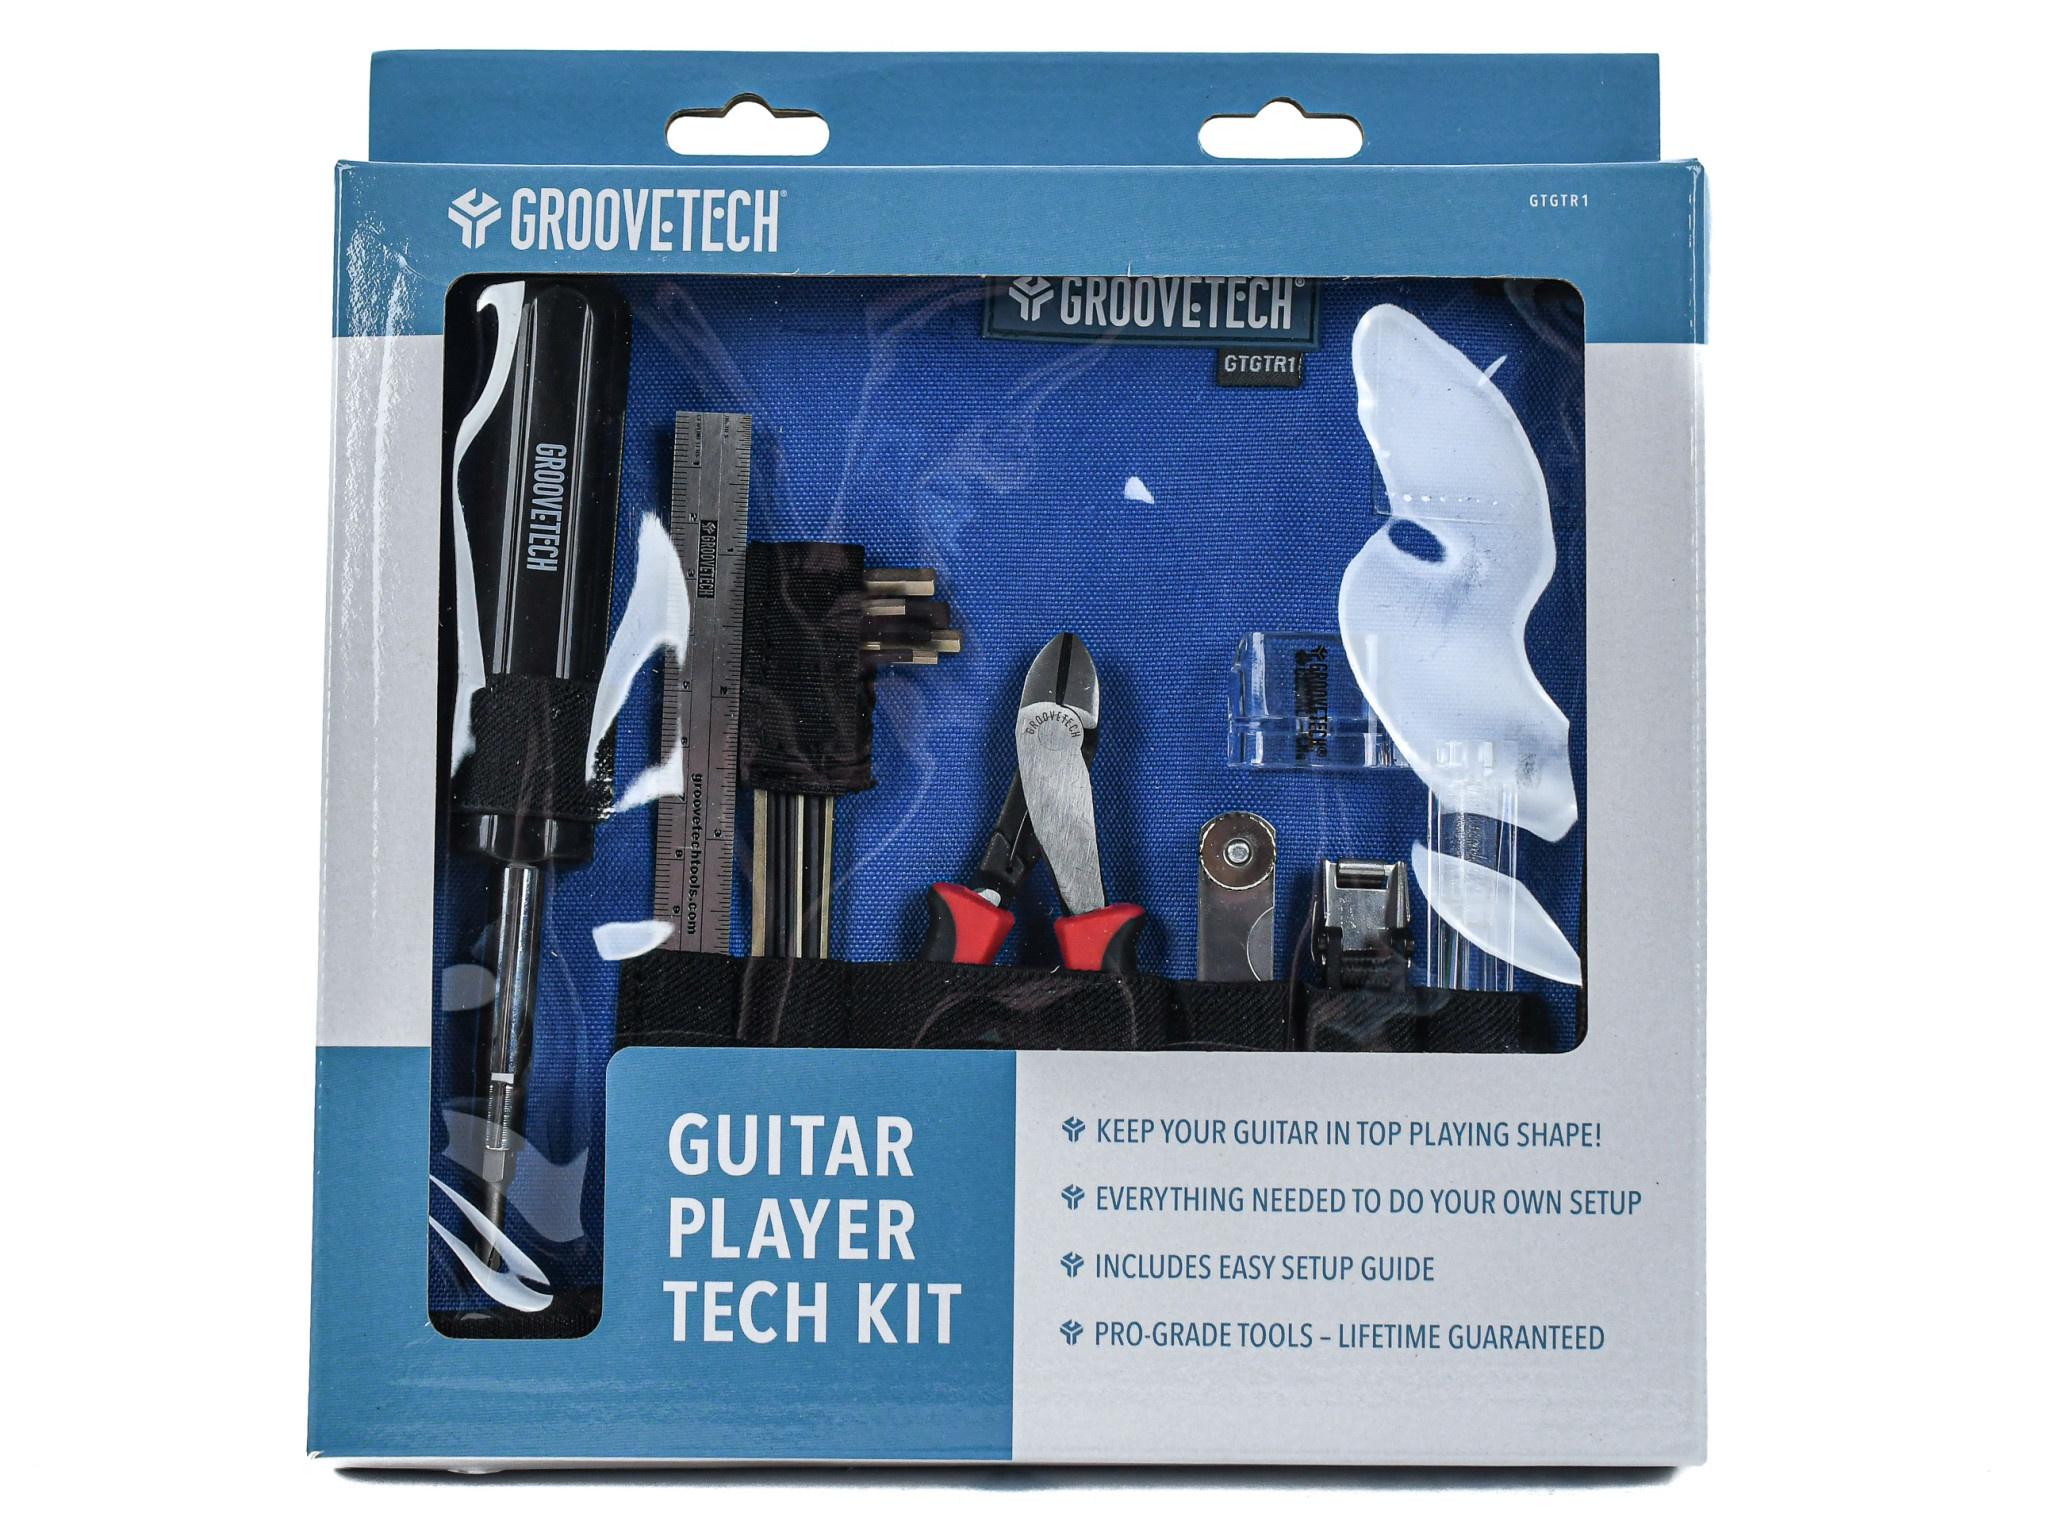 GrooveTech Guitar Player Tech Kit